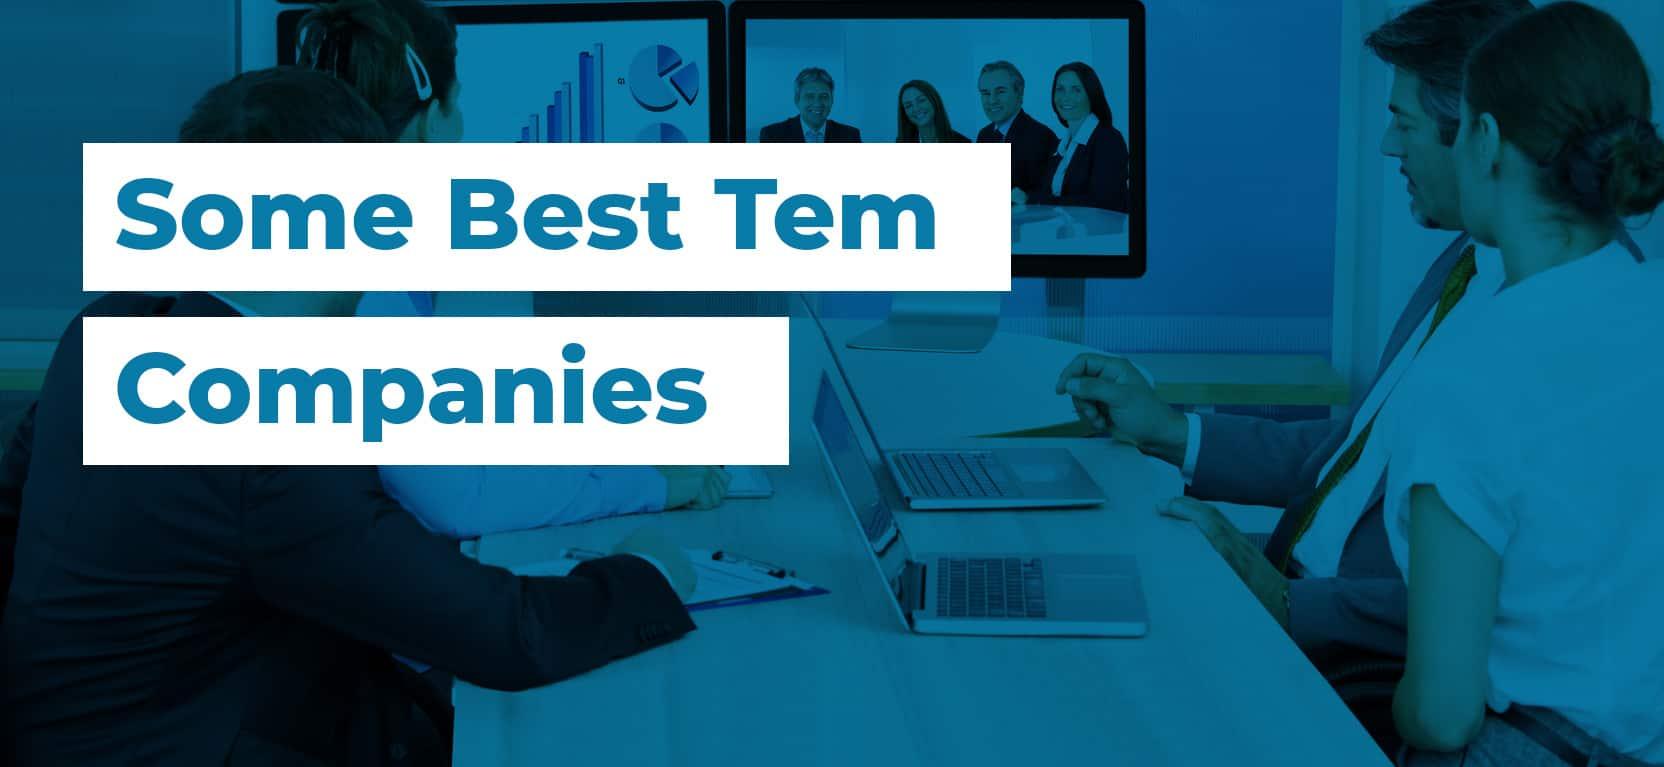 61 Some Best Tem Companies3